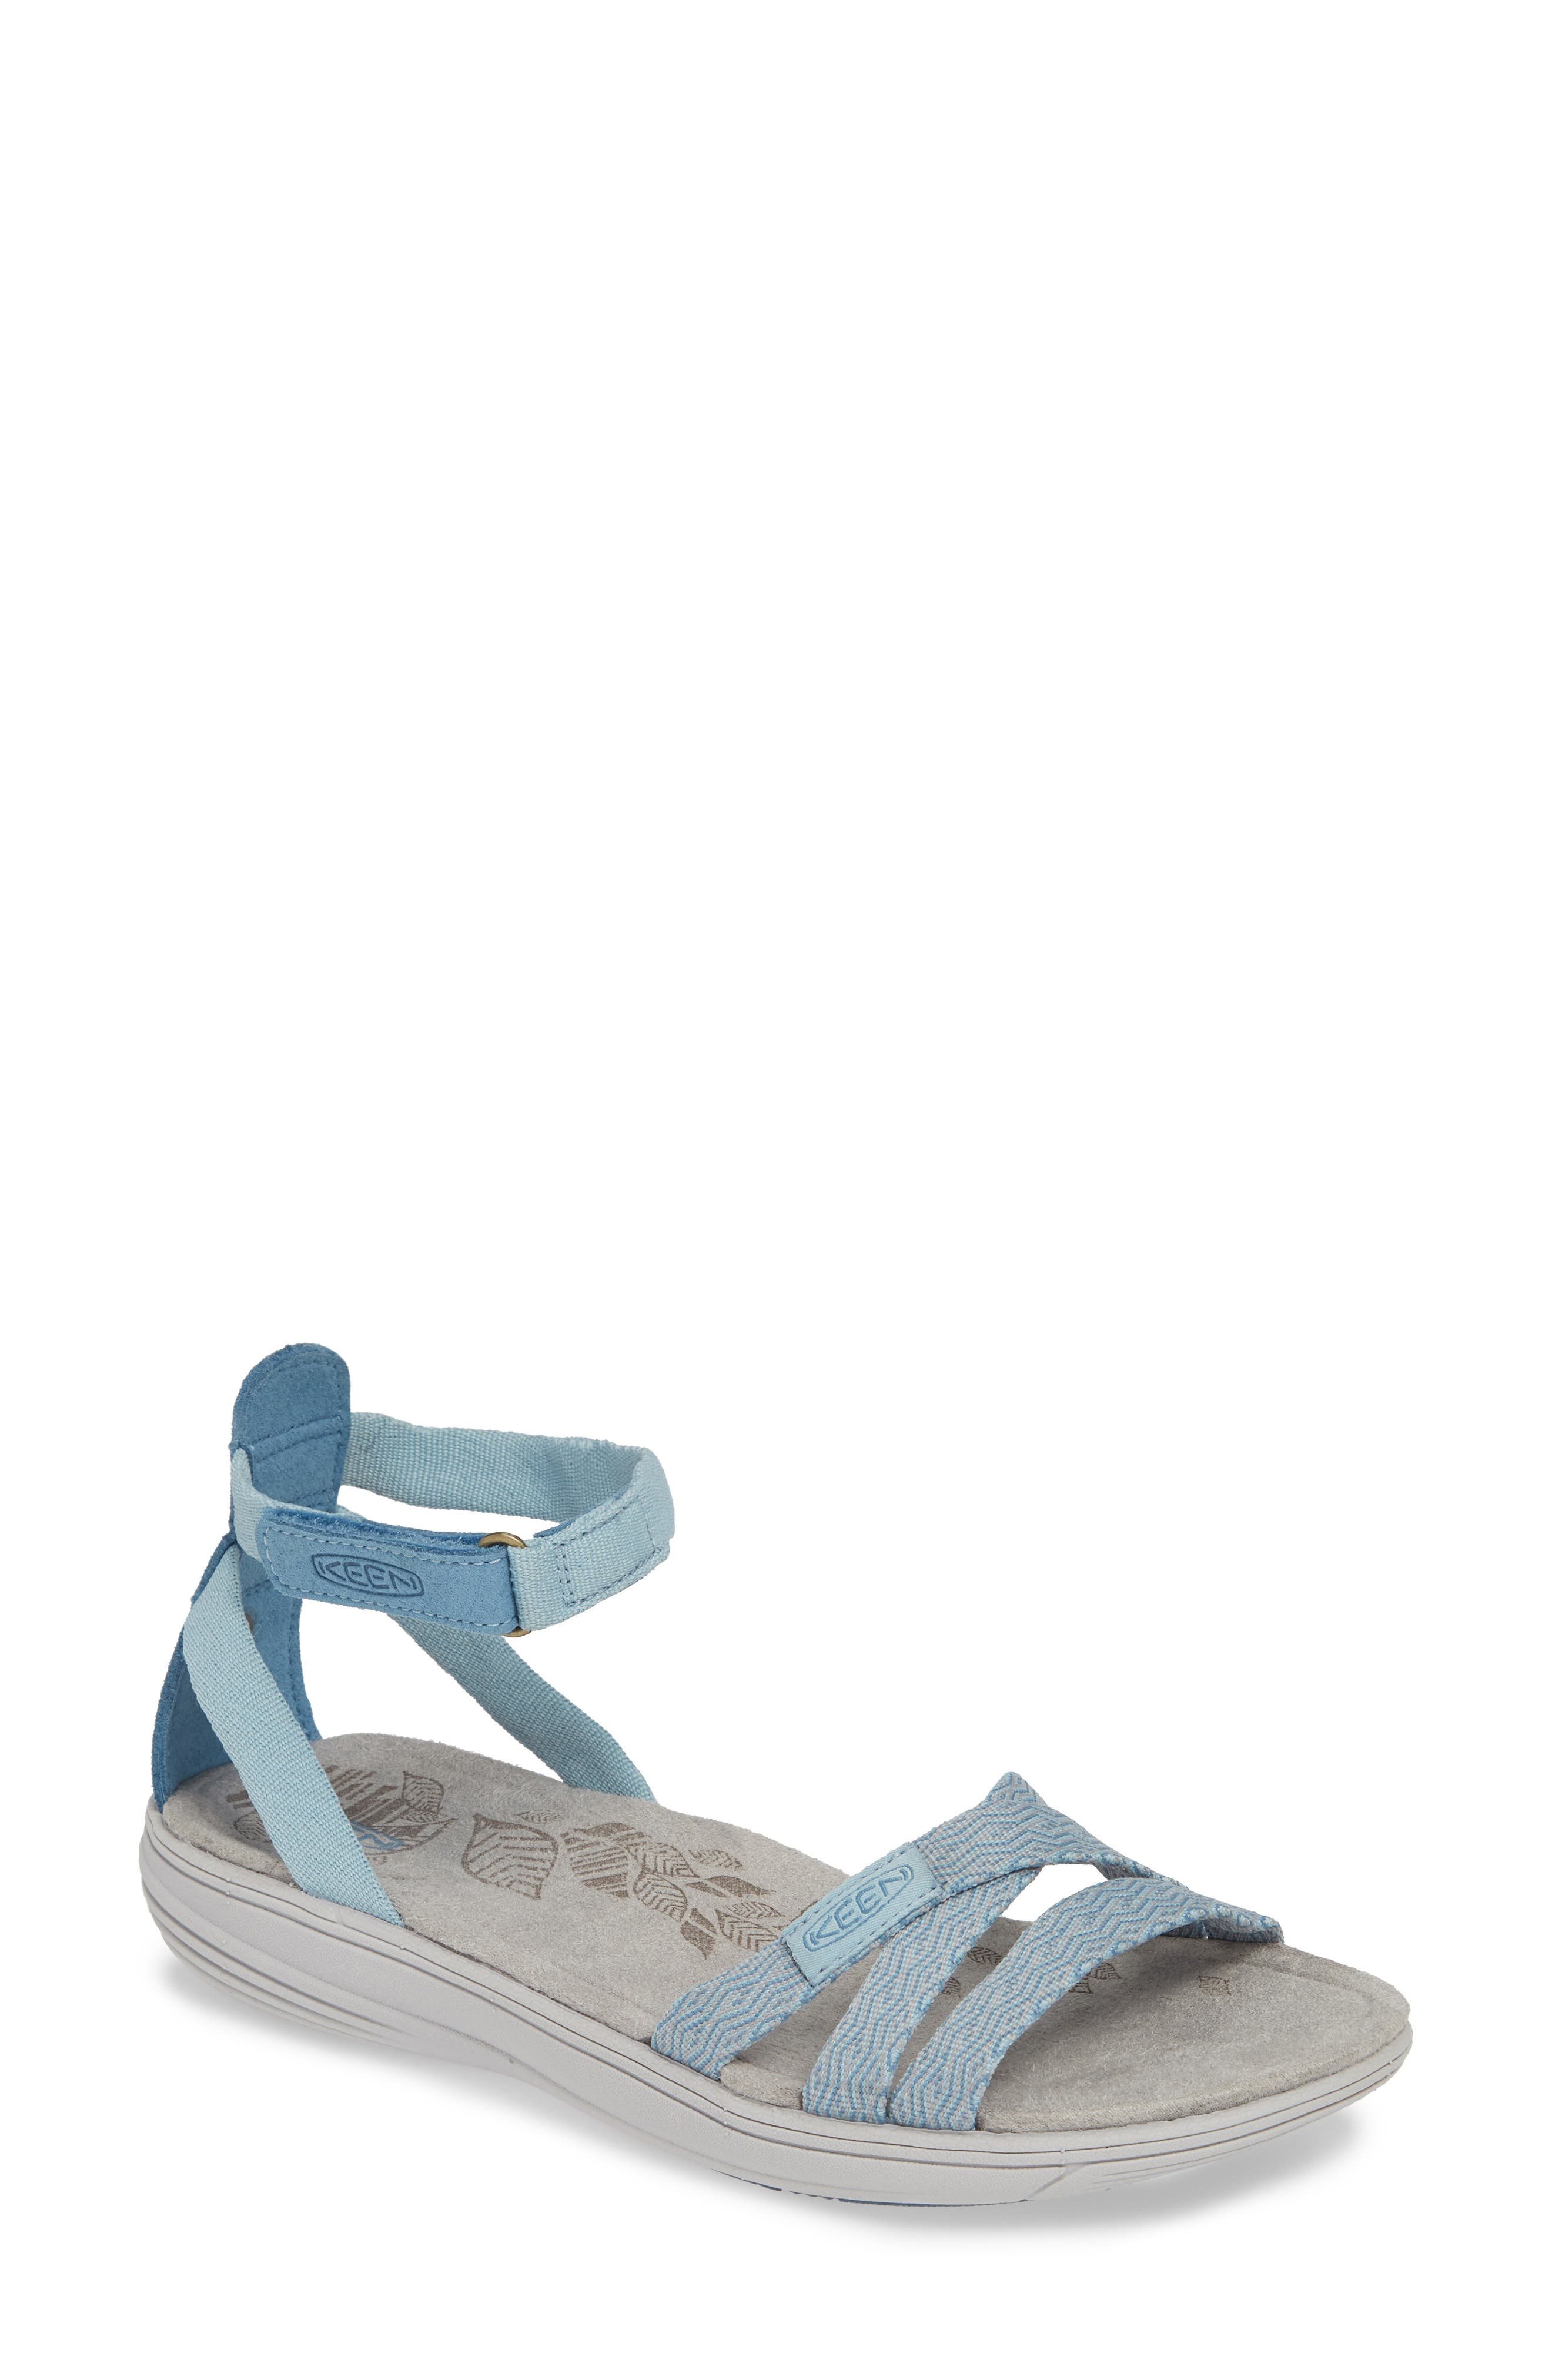 ef383abe45e Keen Damaya Ankle Strap Sandal- Blue